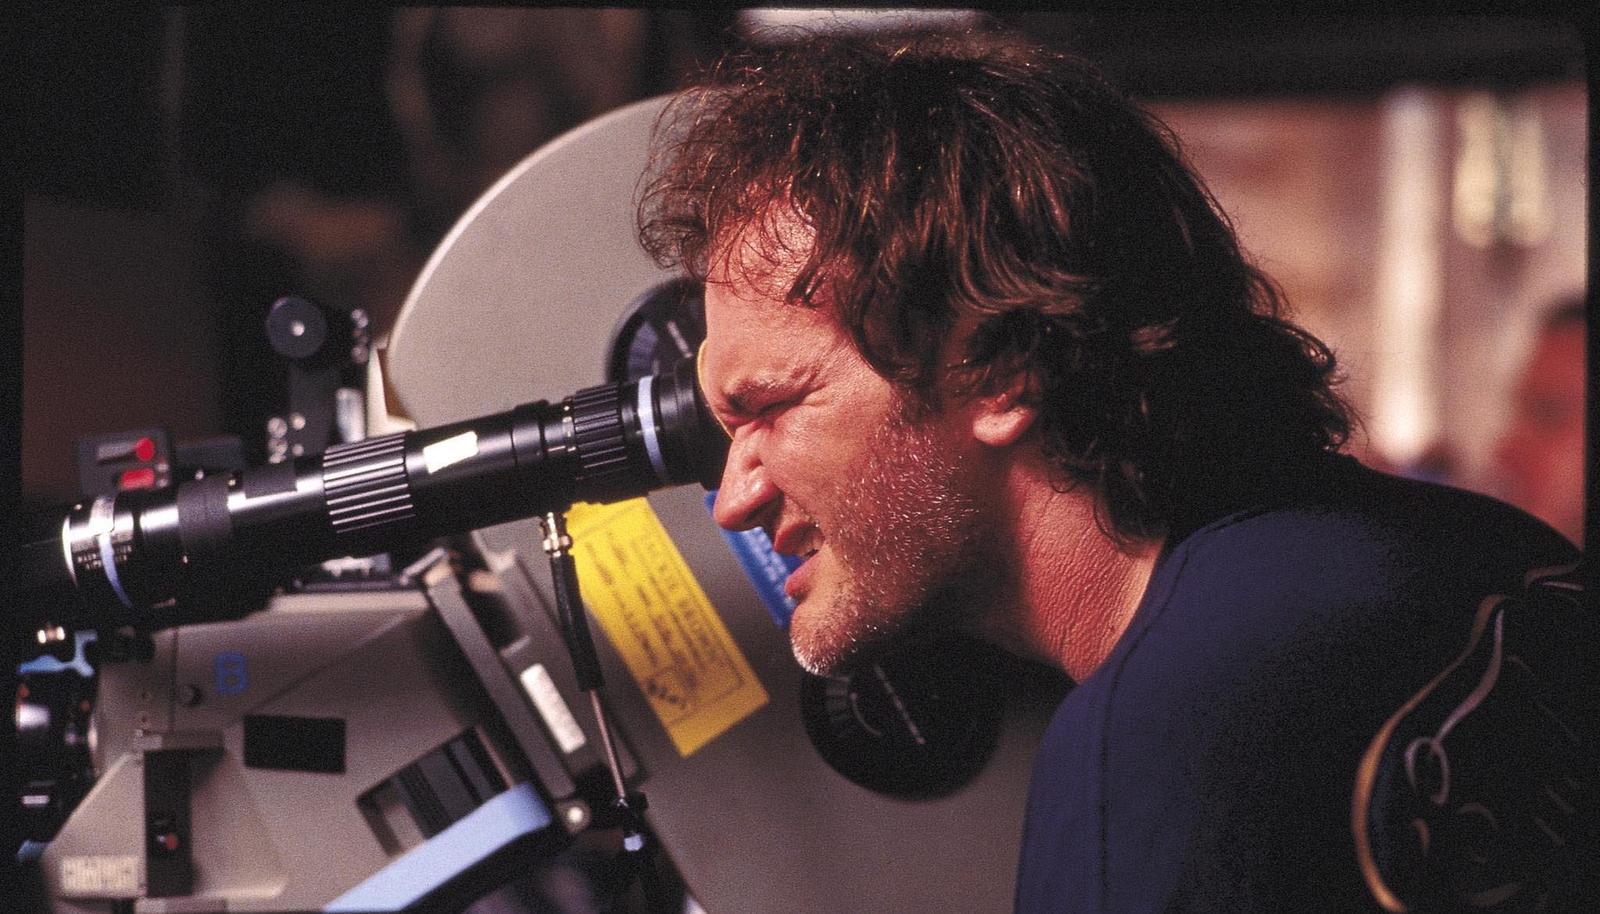 [Cinéaste culte] Quentin Tarantino : conteur post-moderne